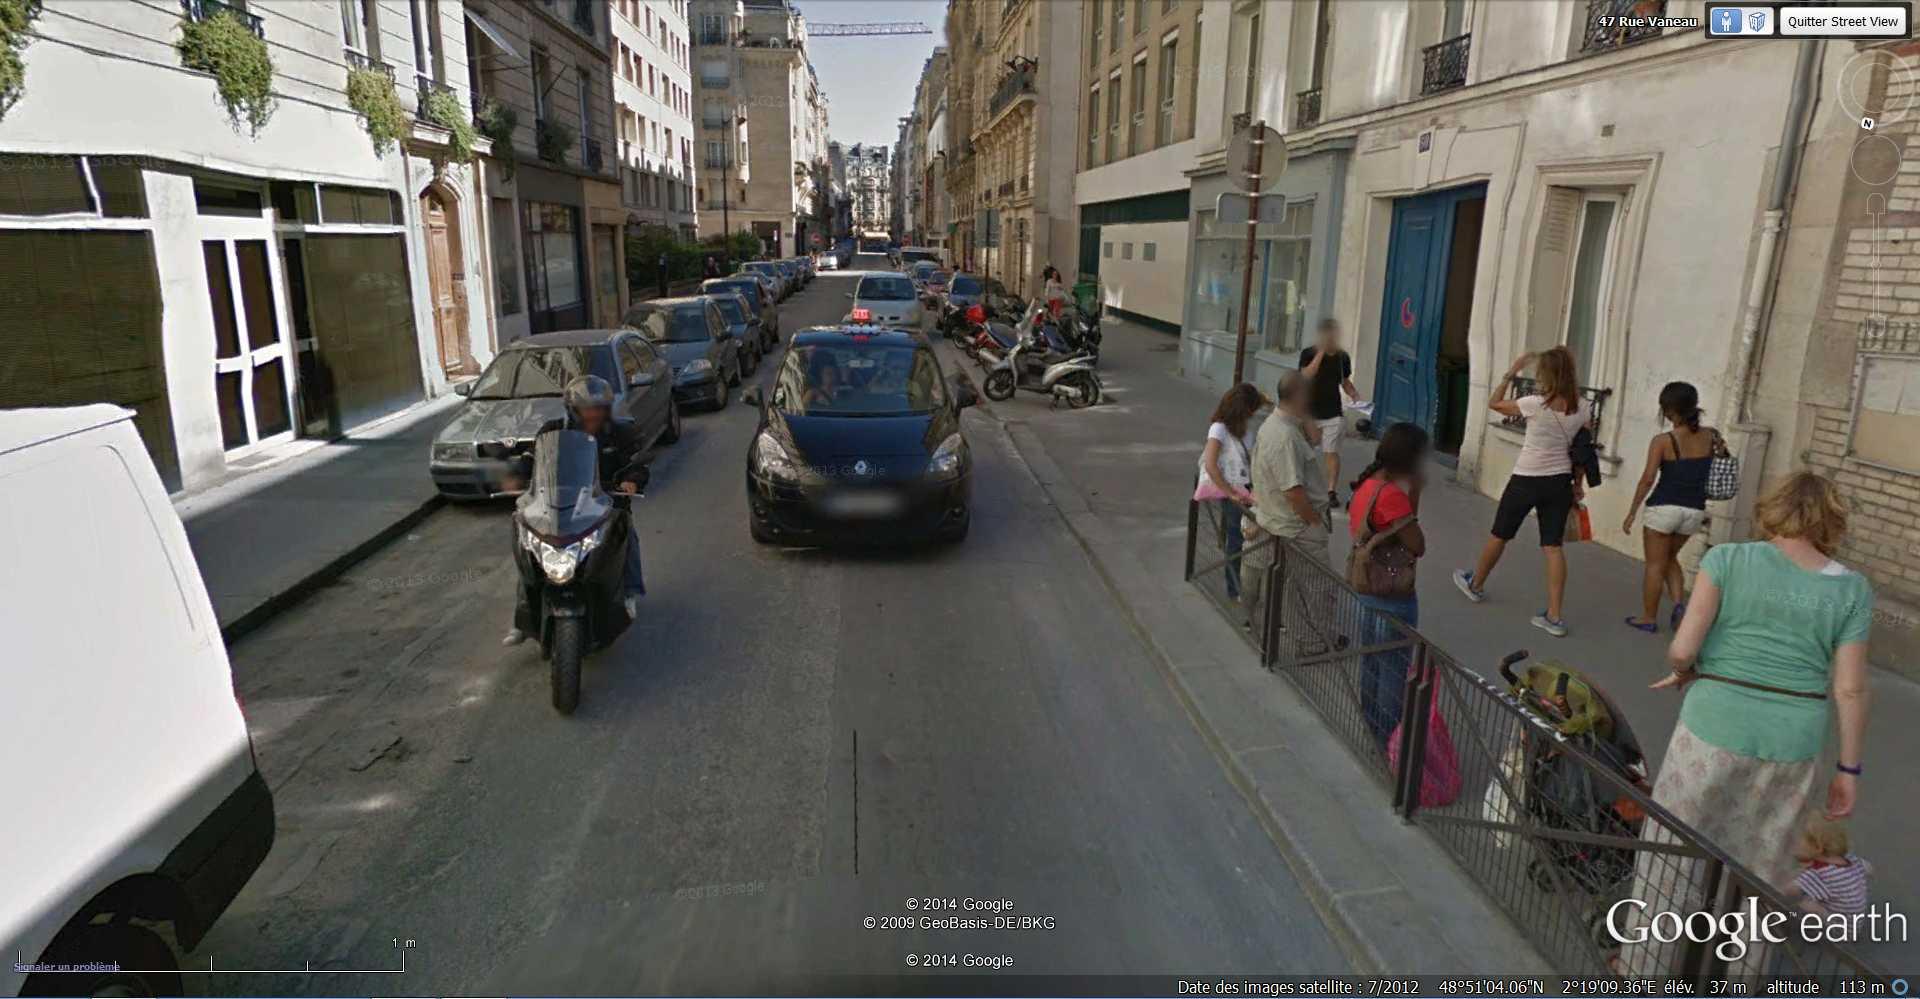 STREET VIEW : Chute de moto - rue Vaneau - Paris - France  2014-313